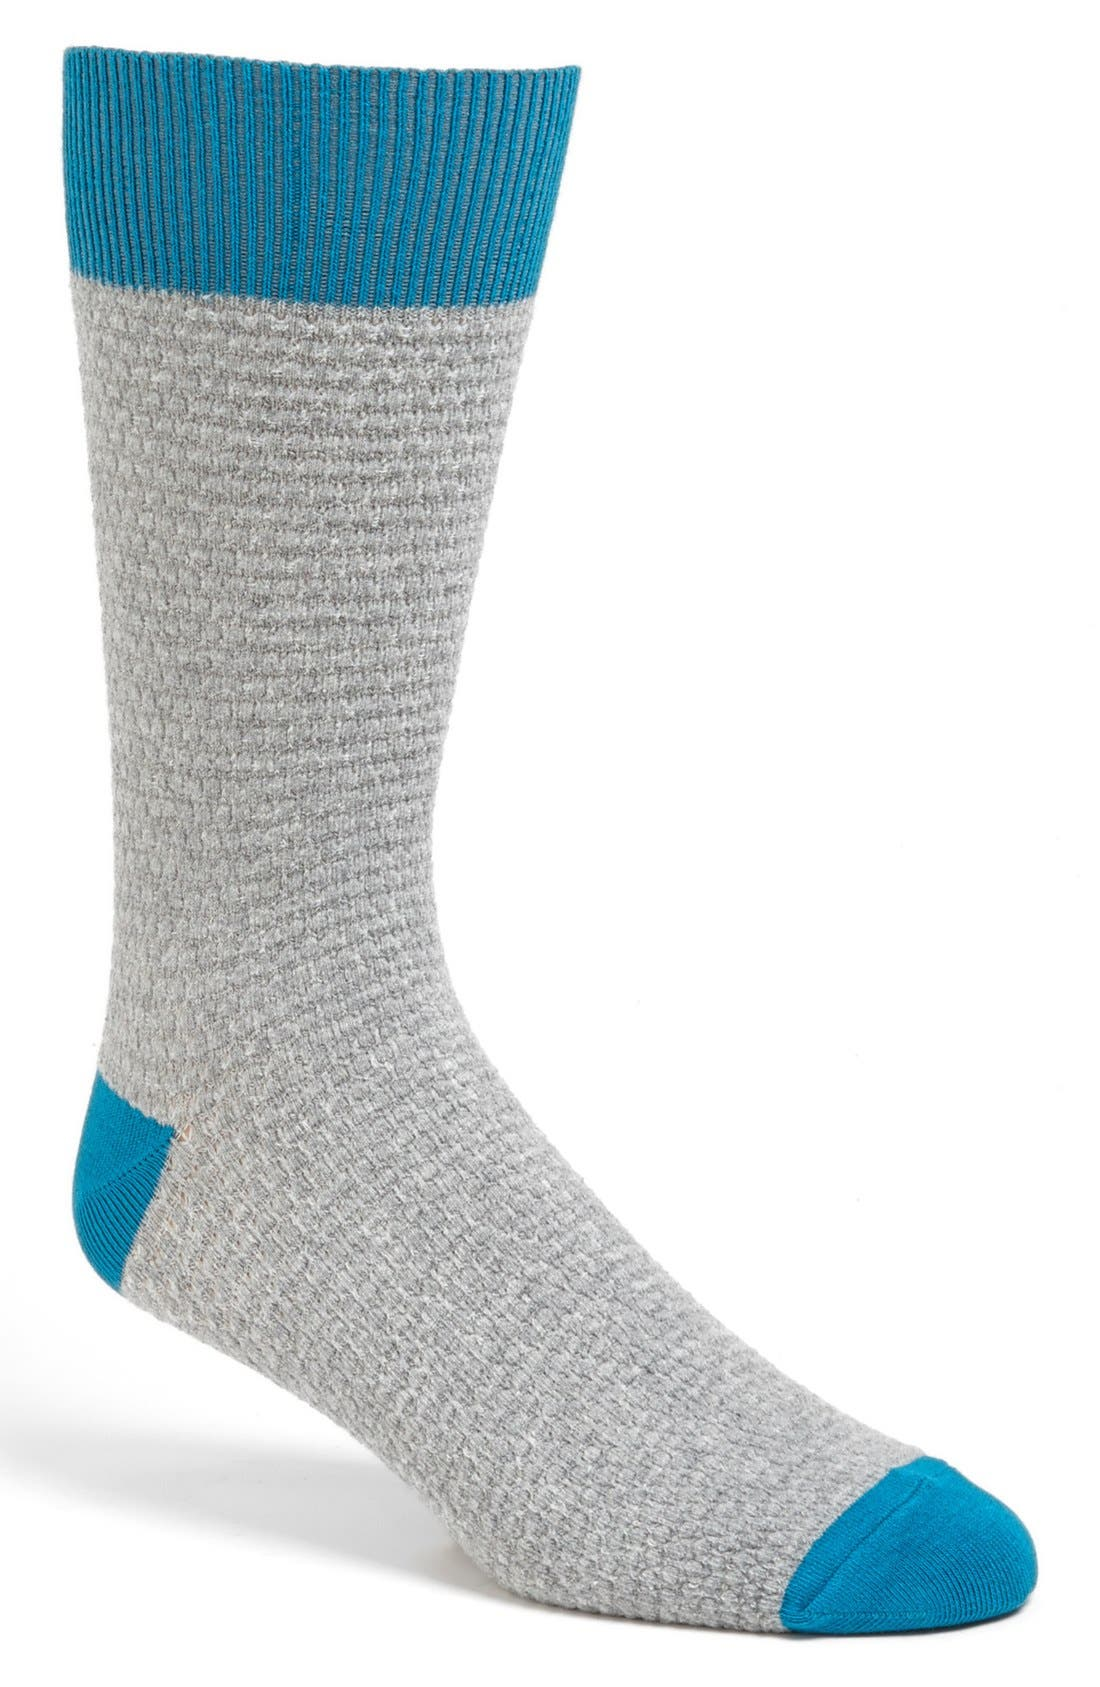 Main Image - PACT Waffle Knit Sock